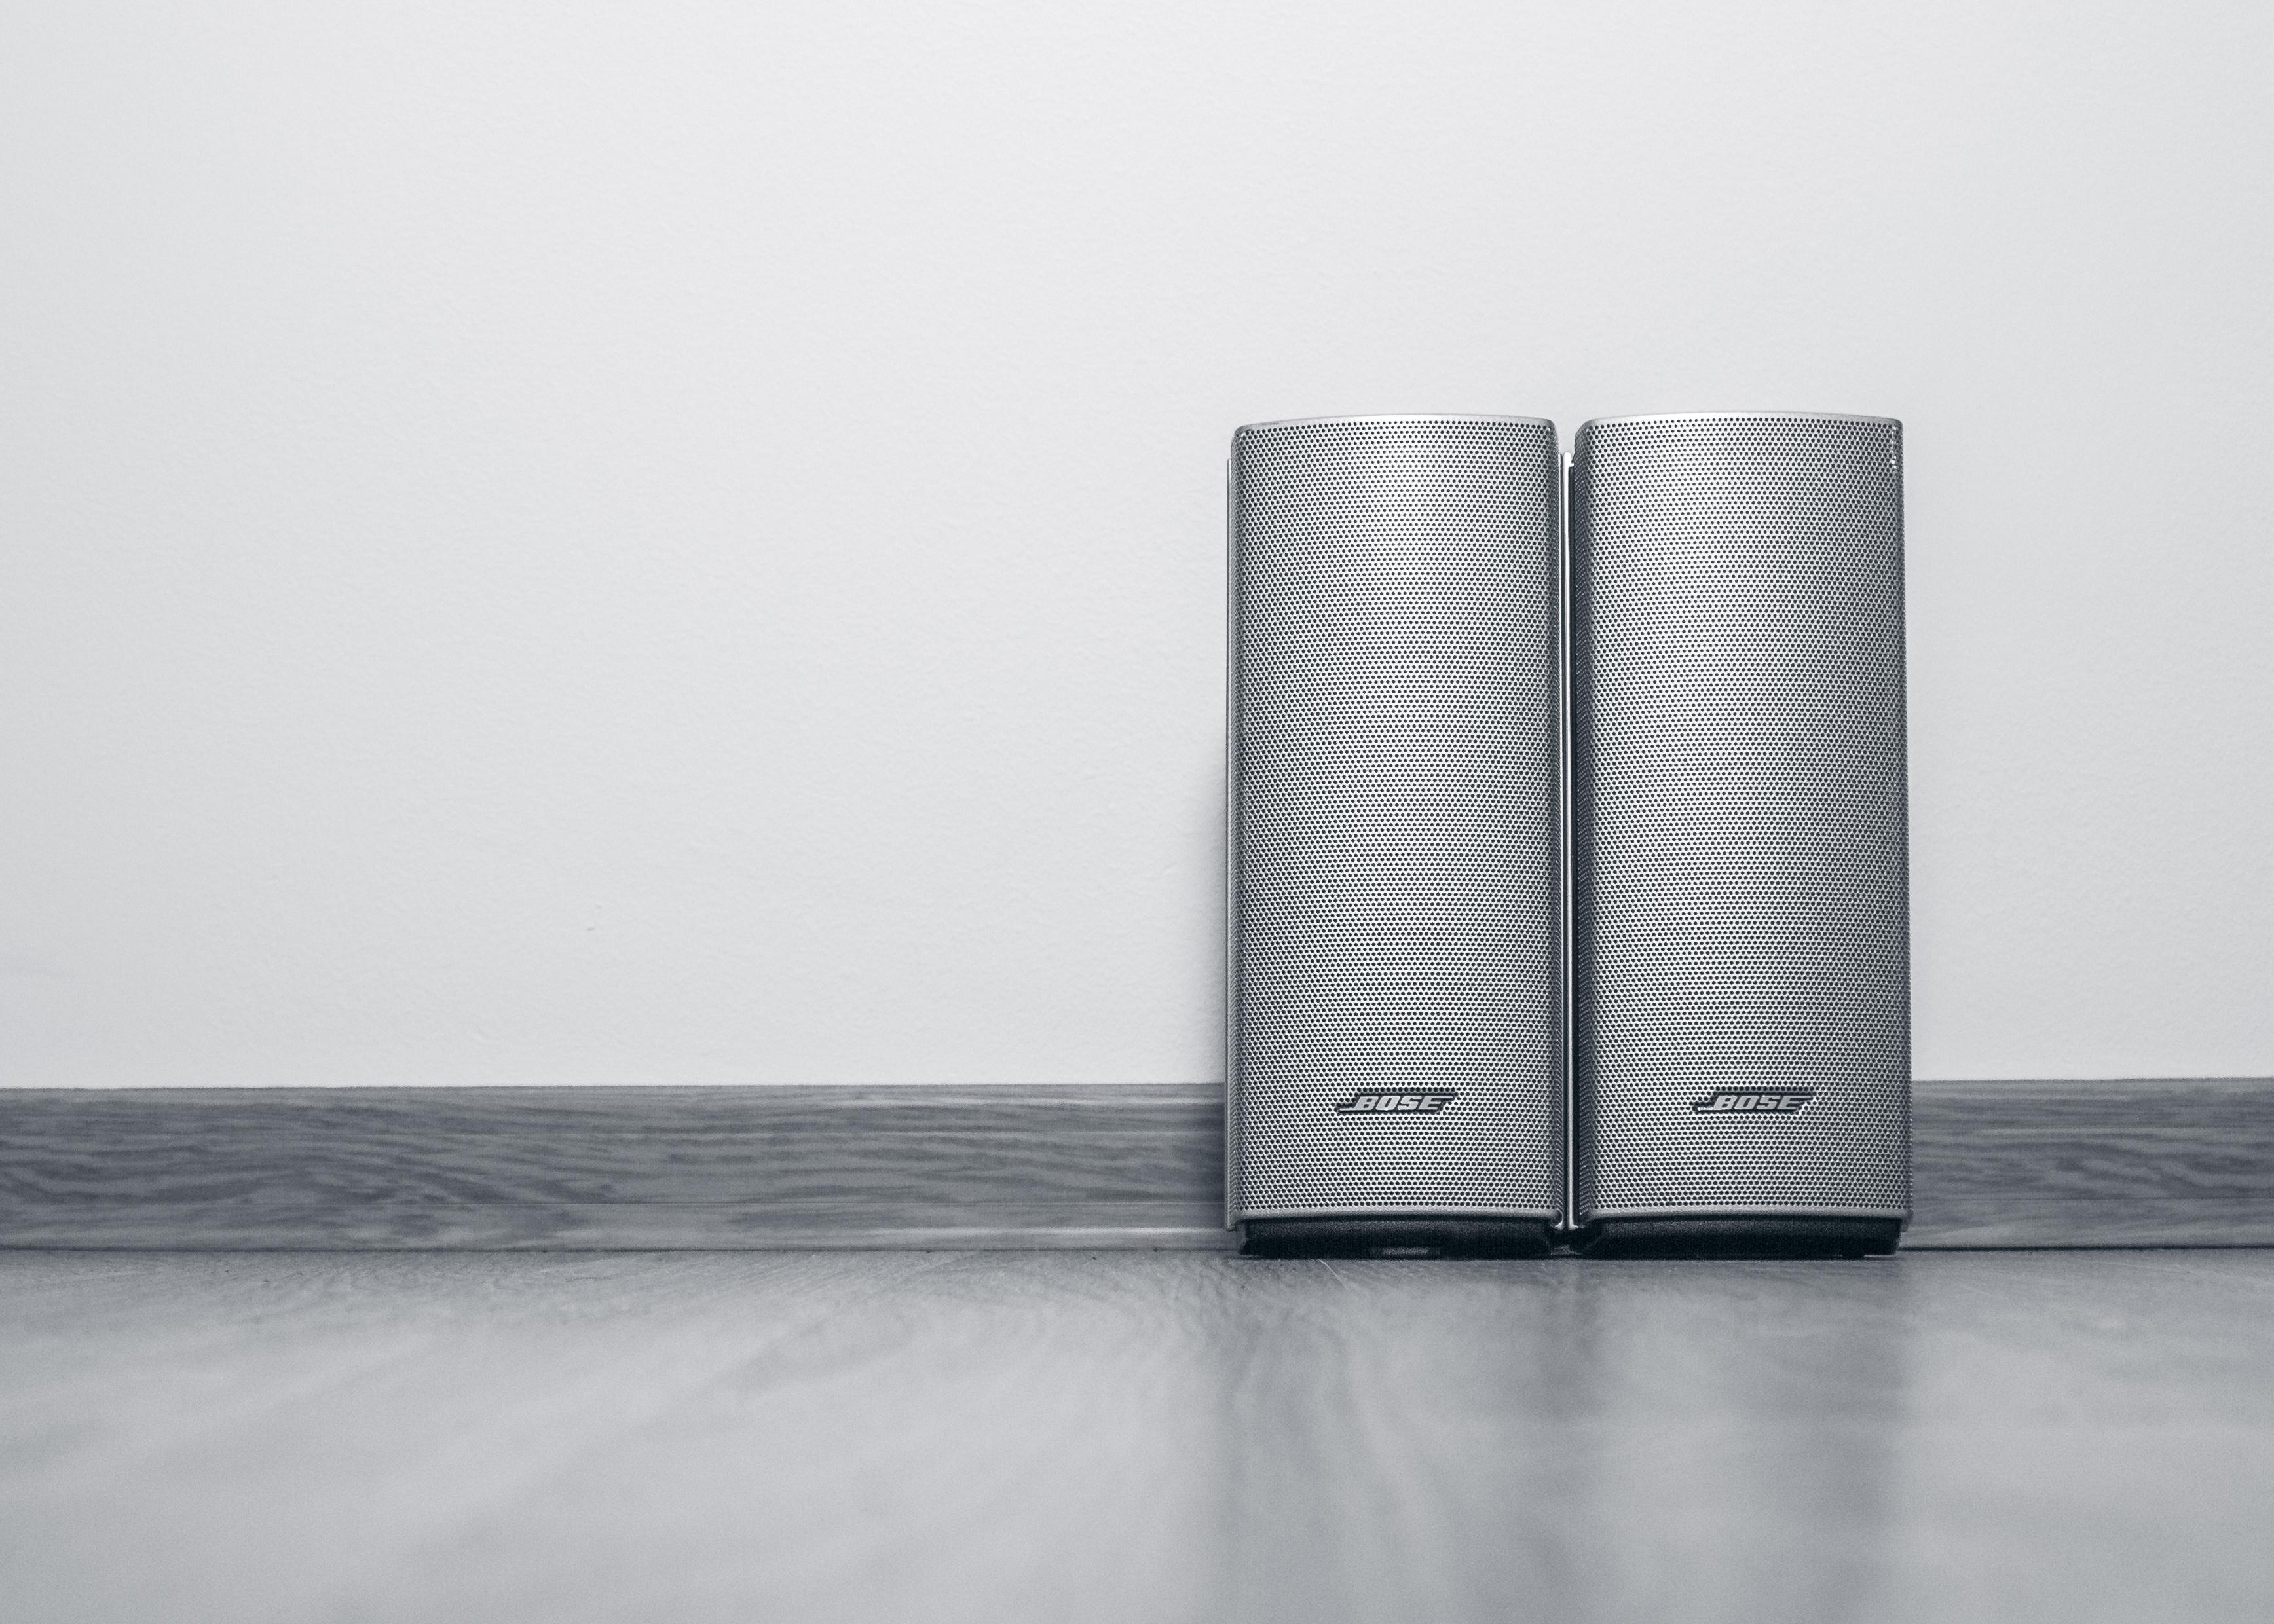 BOSE audio installations